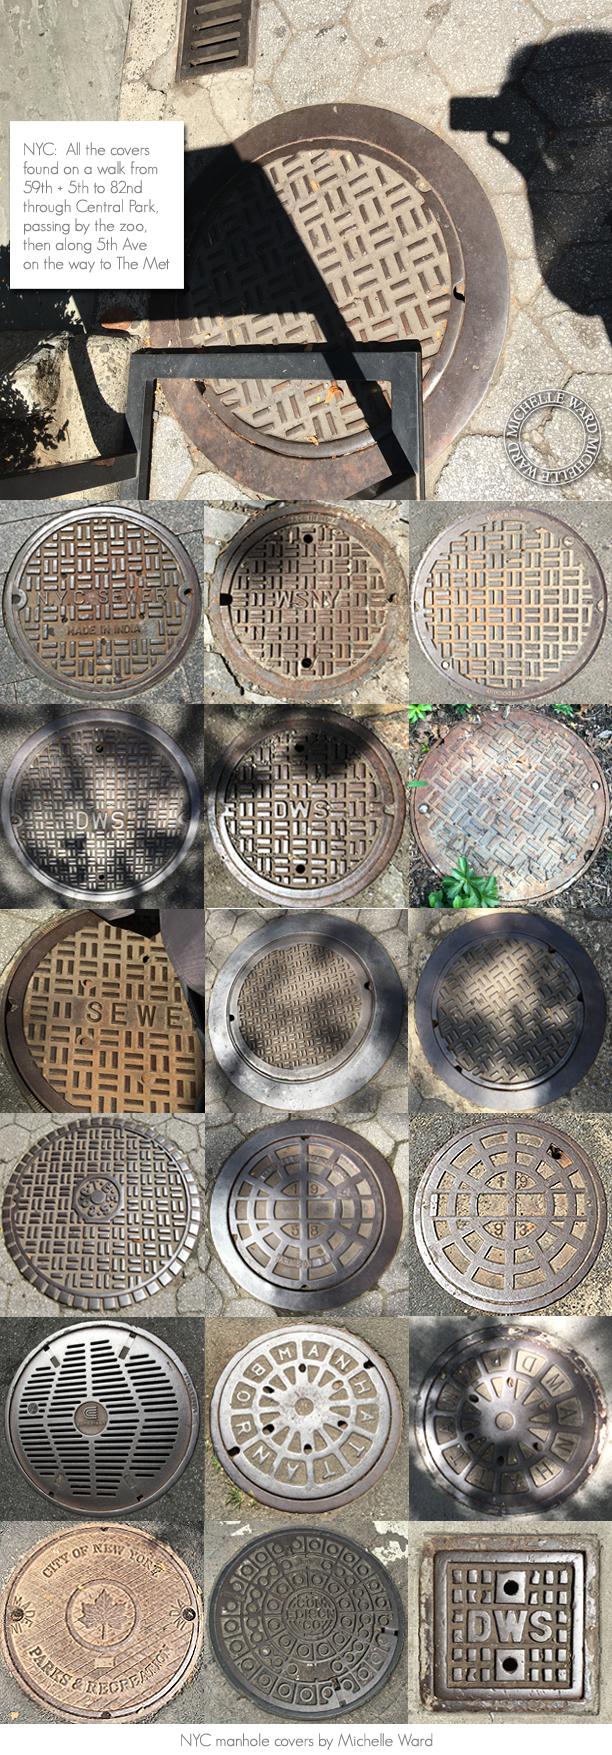 MW NYC Upper East Manholes